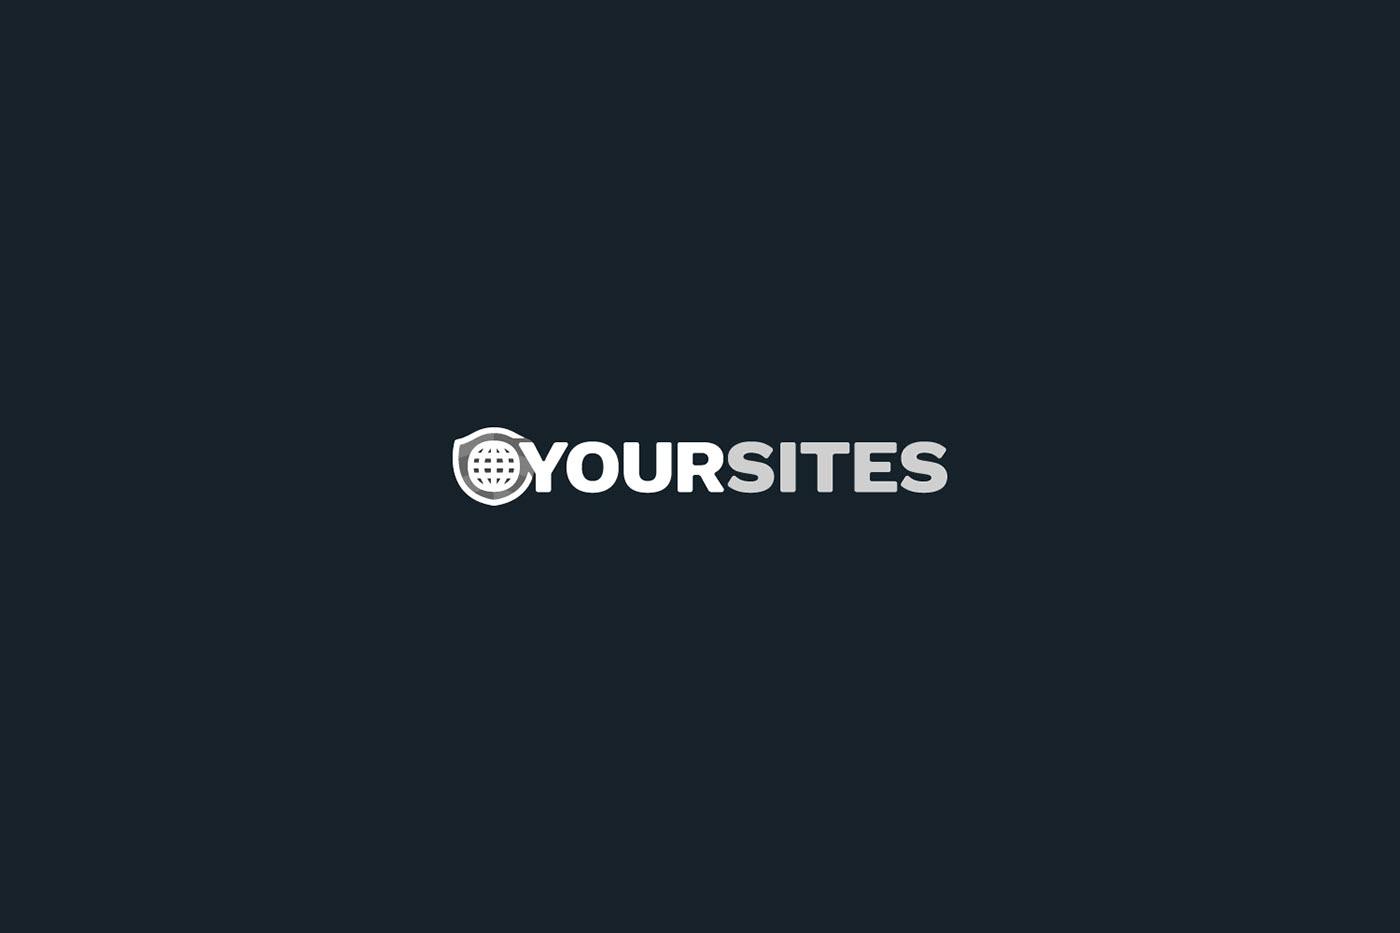 Your Sites Logo on Black